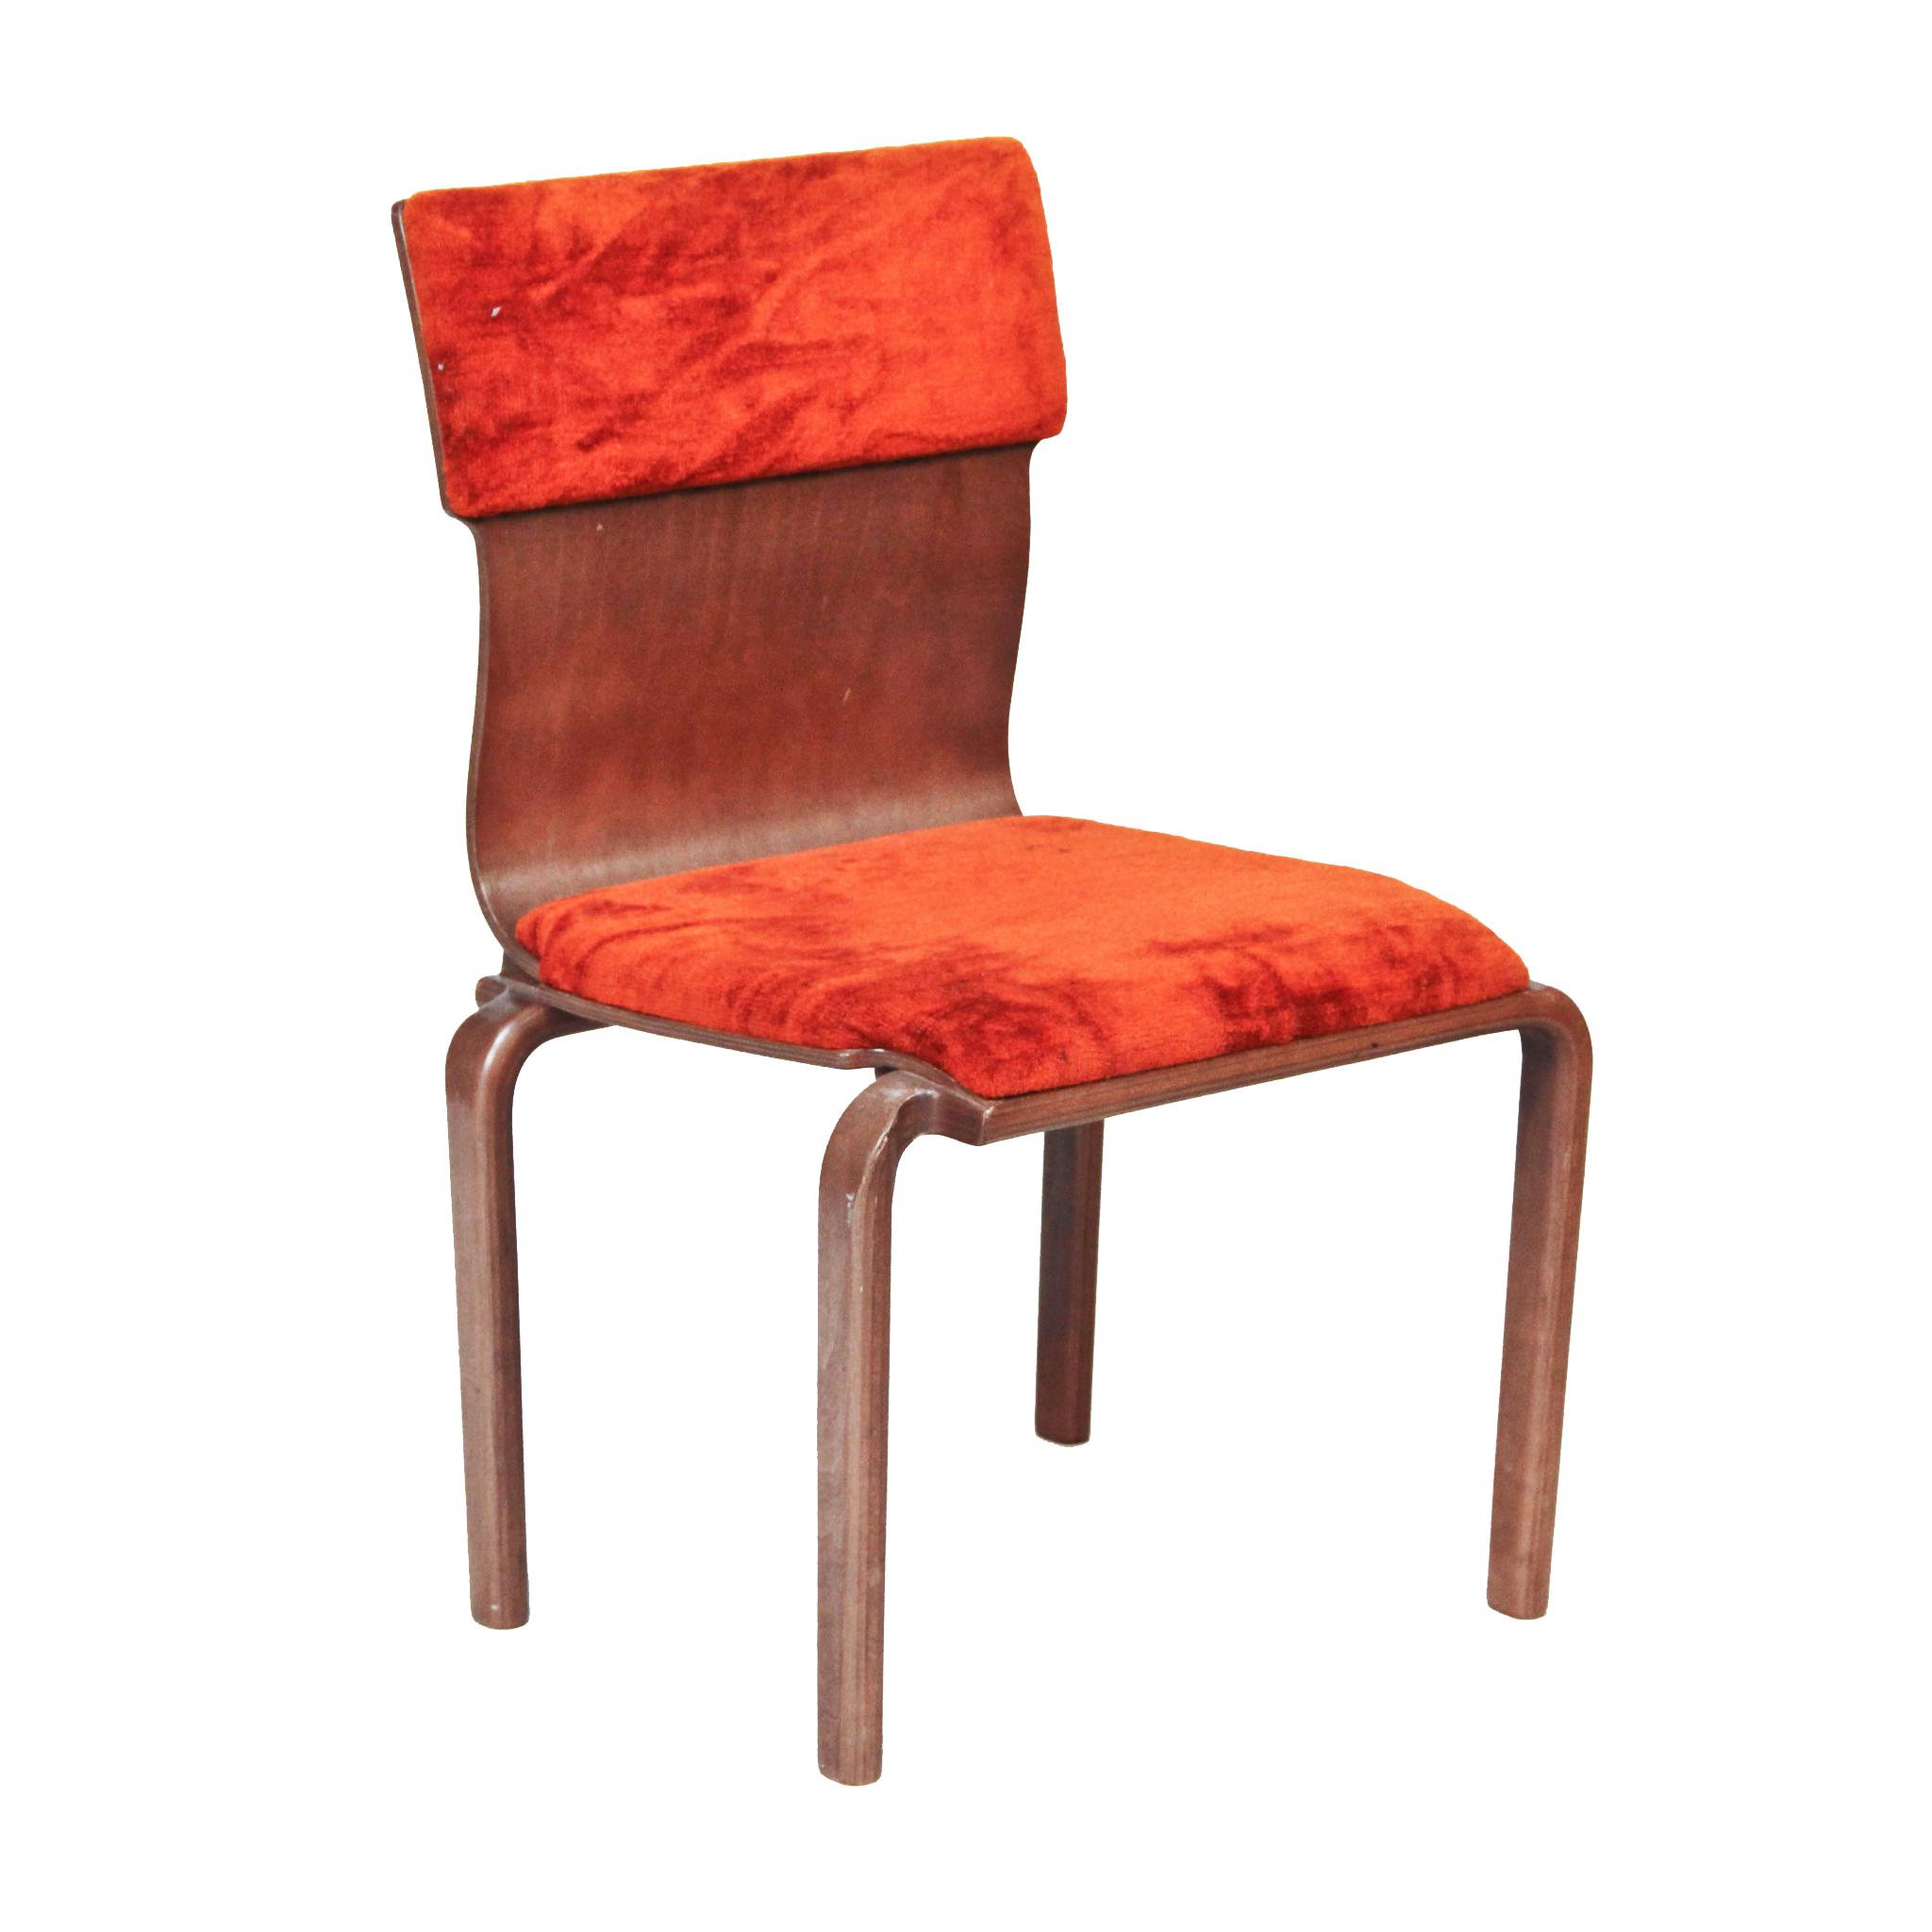 accent chair orange ergonomic canada sleigh back velvet  peter corvallis